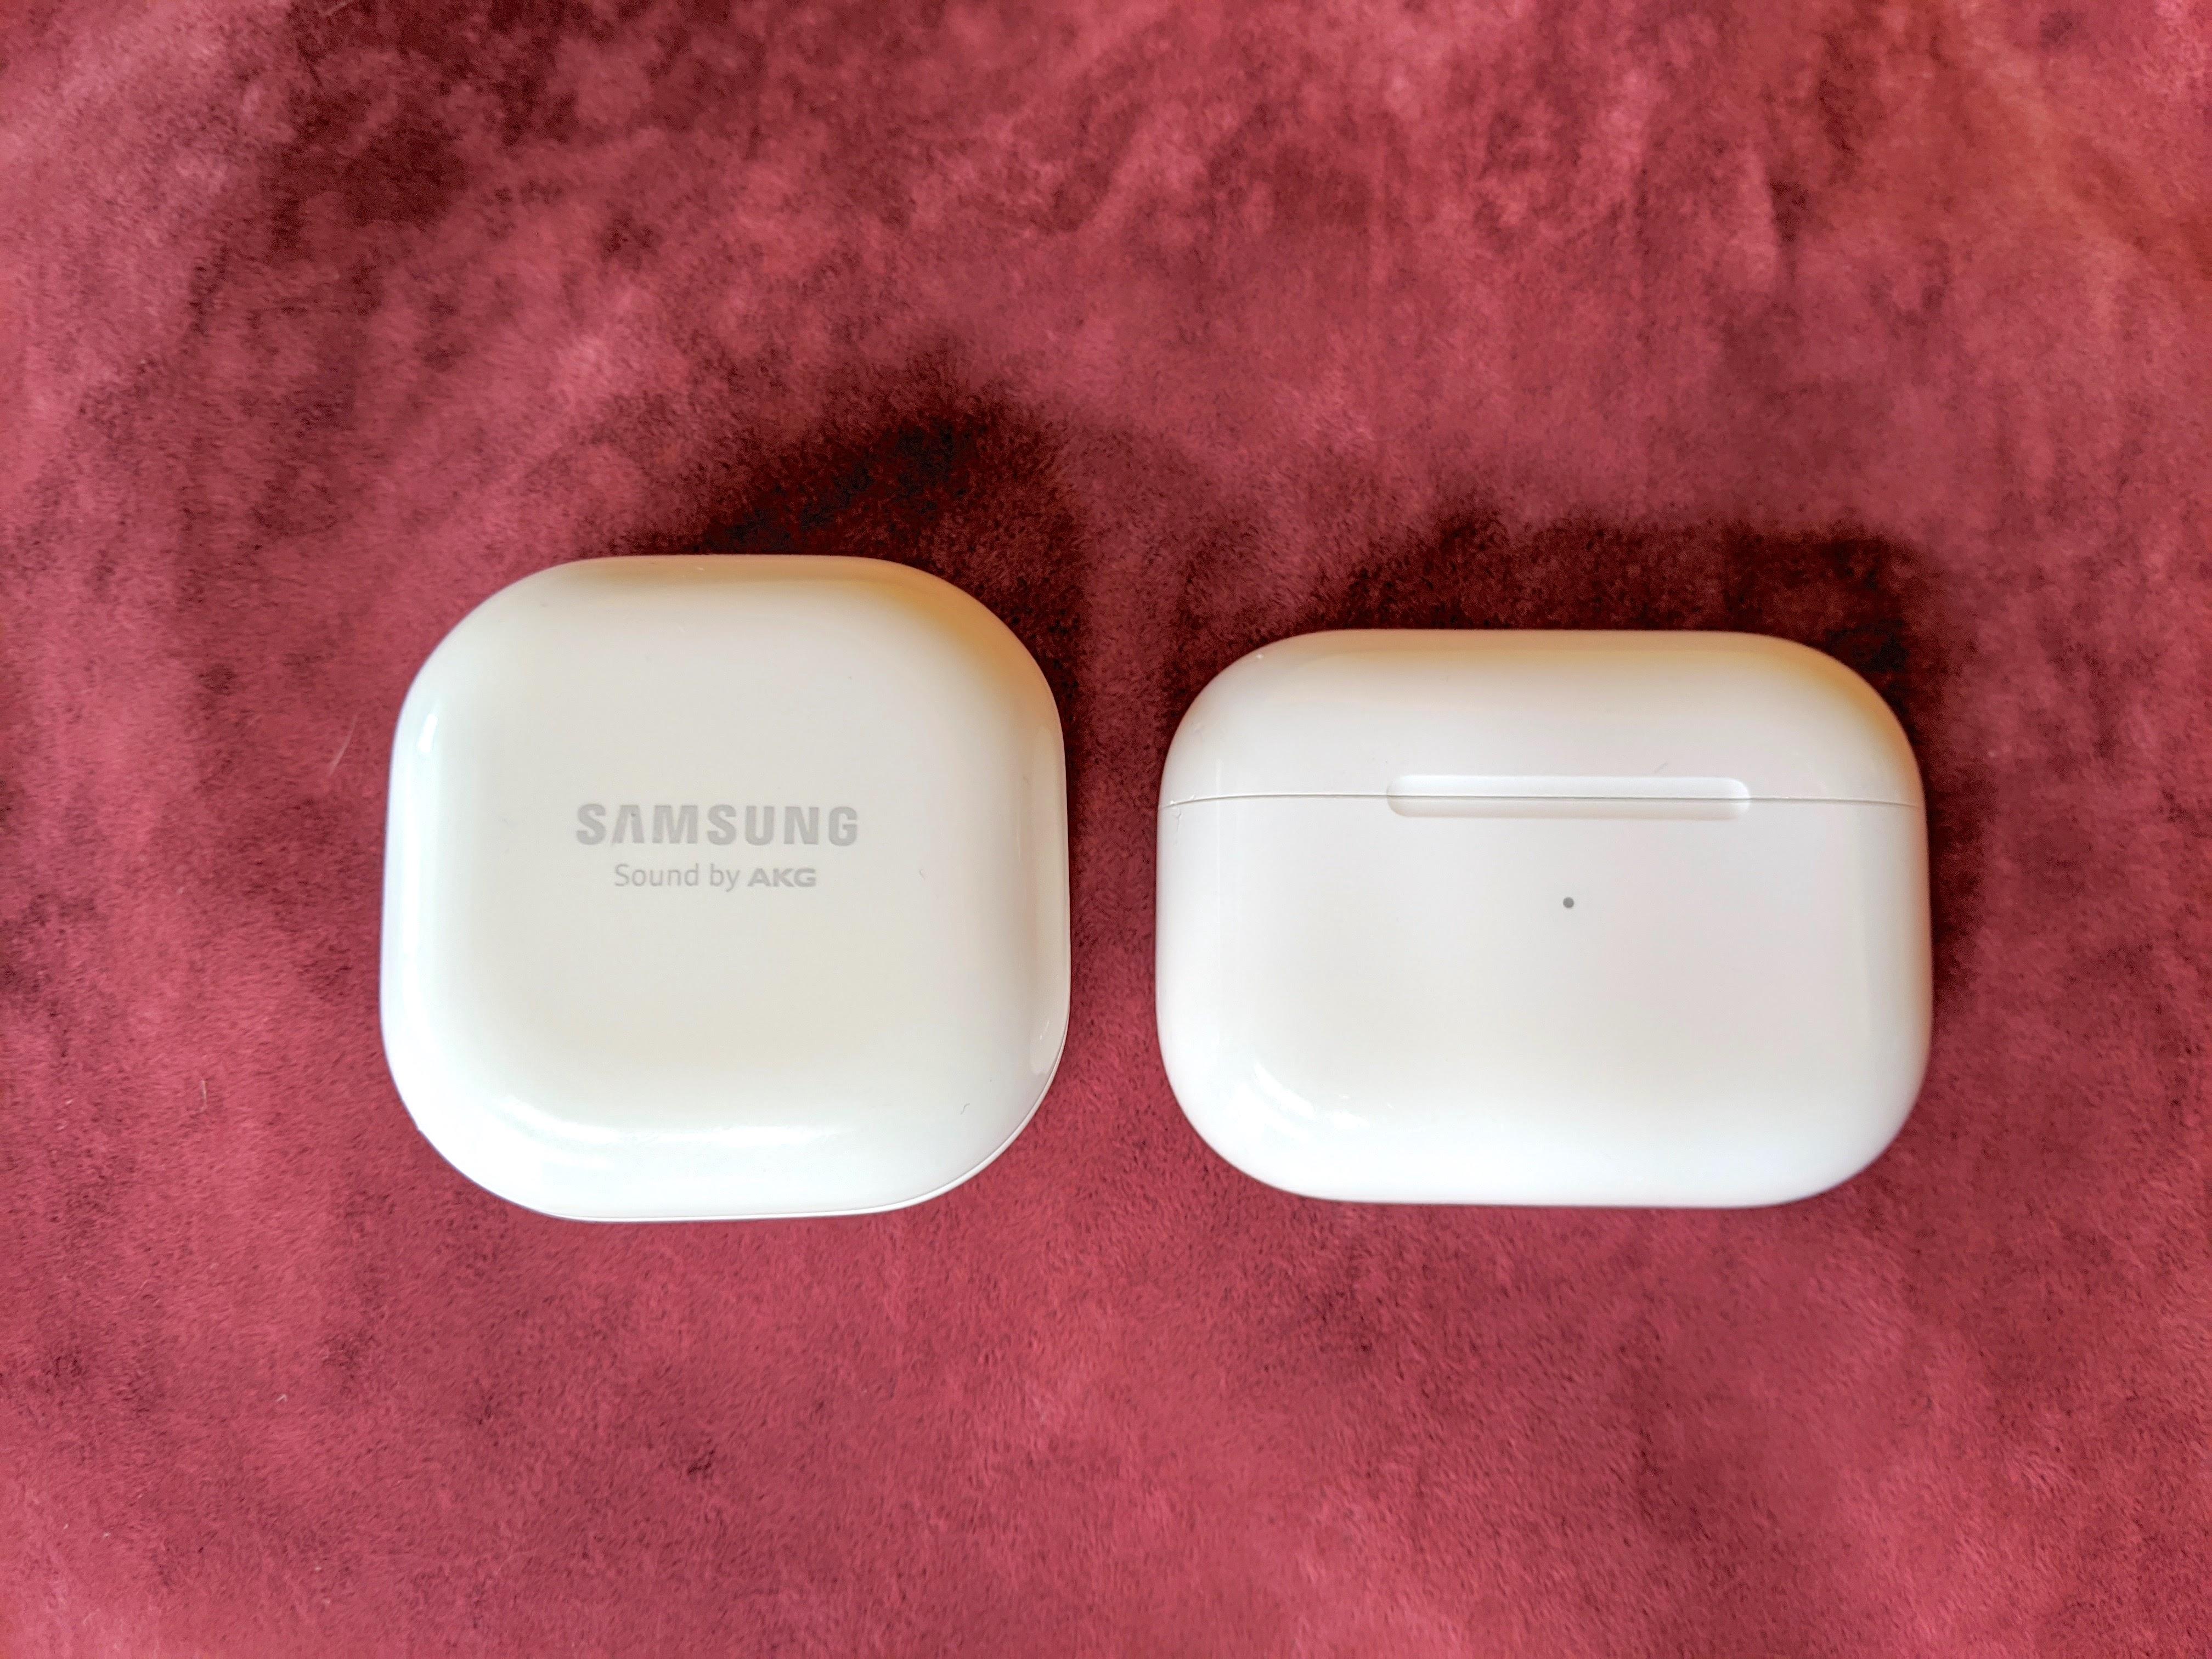 AirPods Pro vs Samsung Galaxy Buds Live